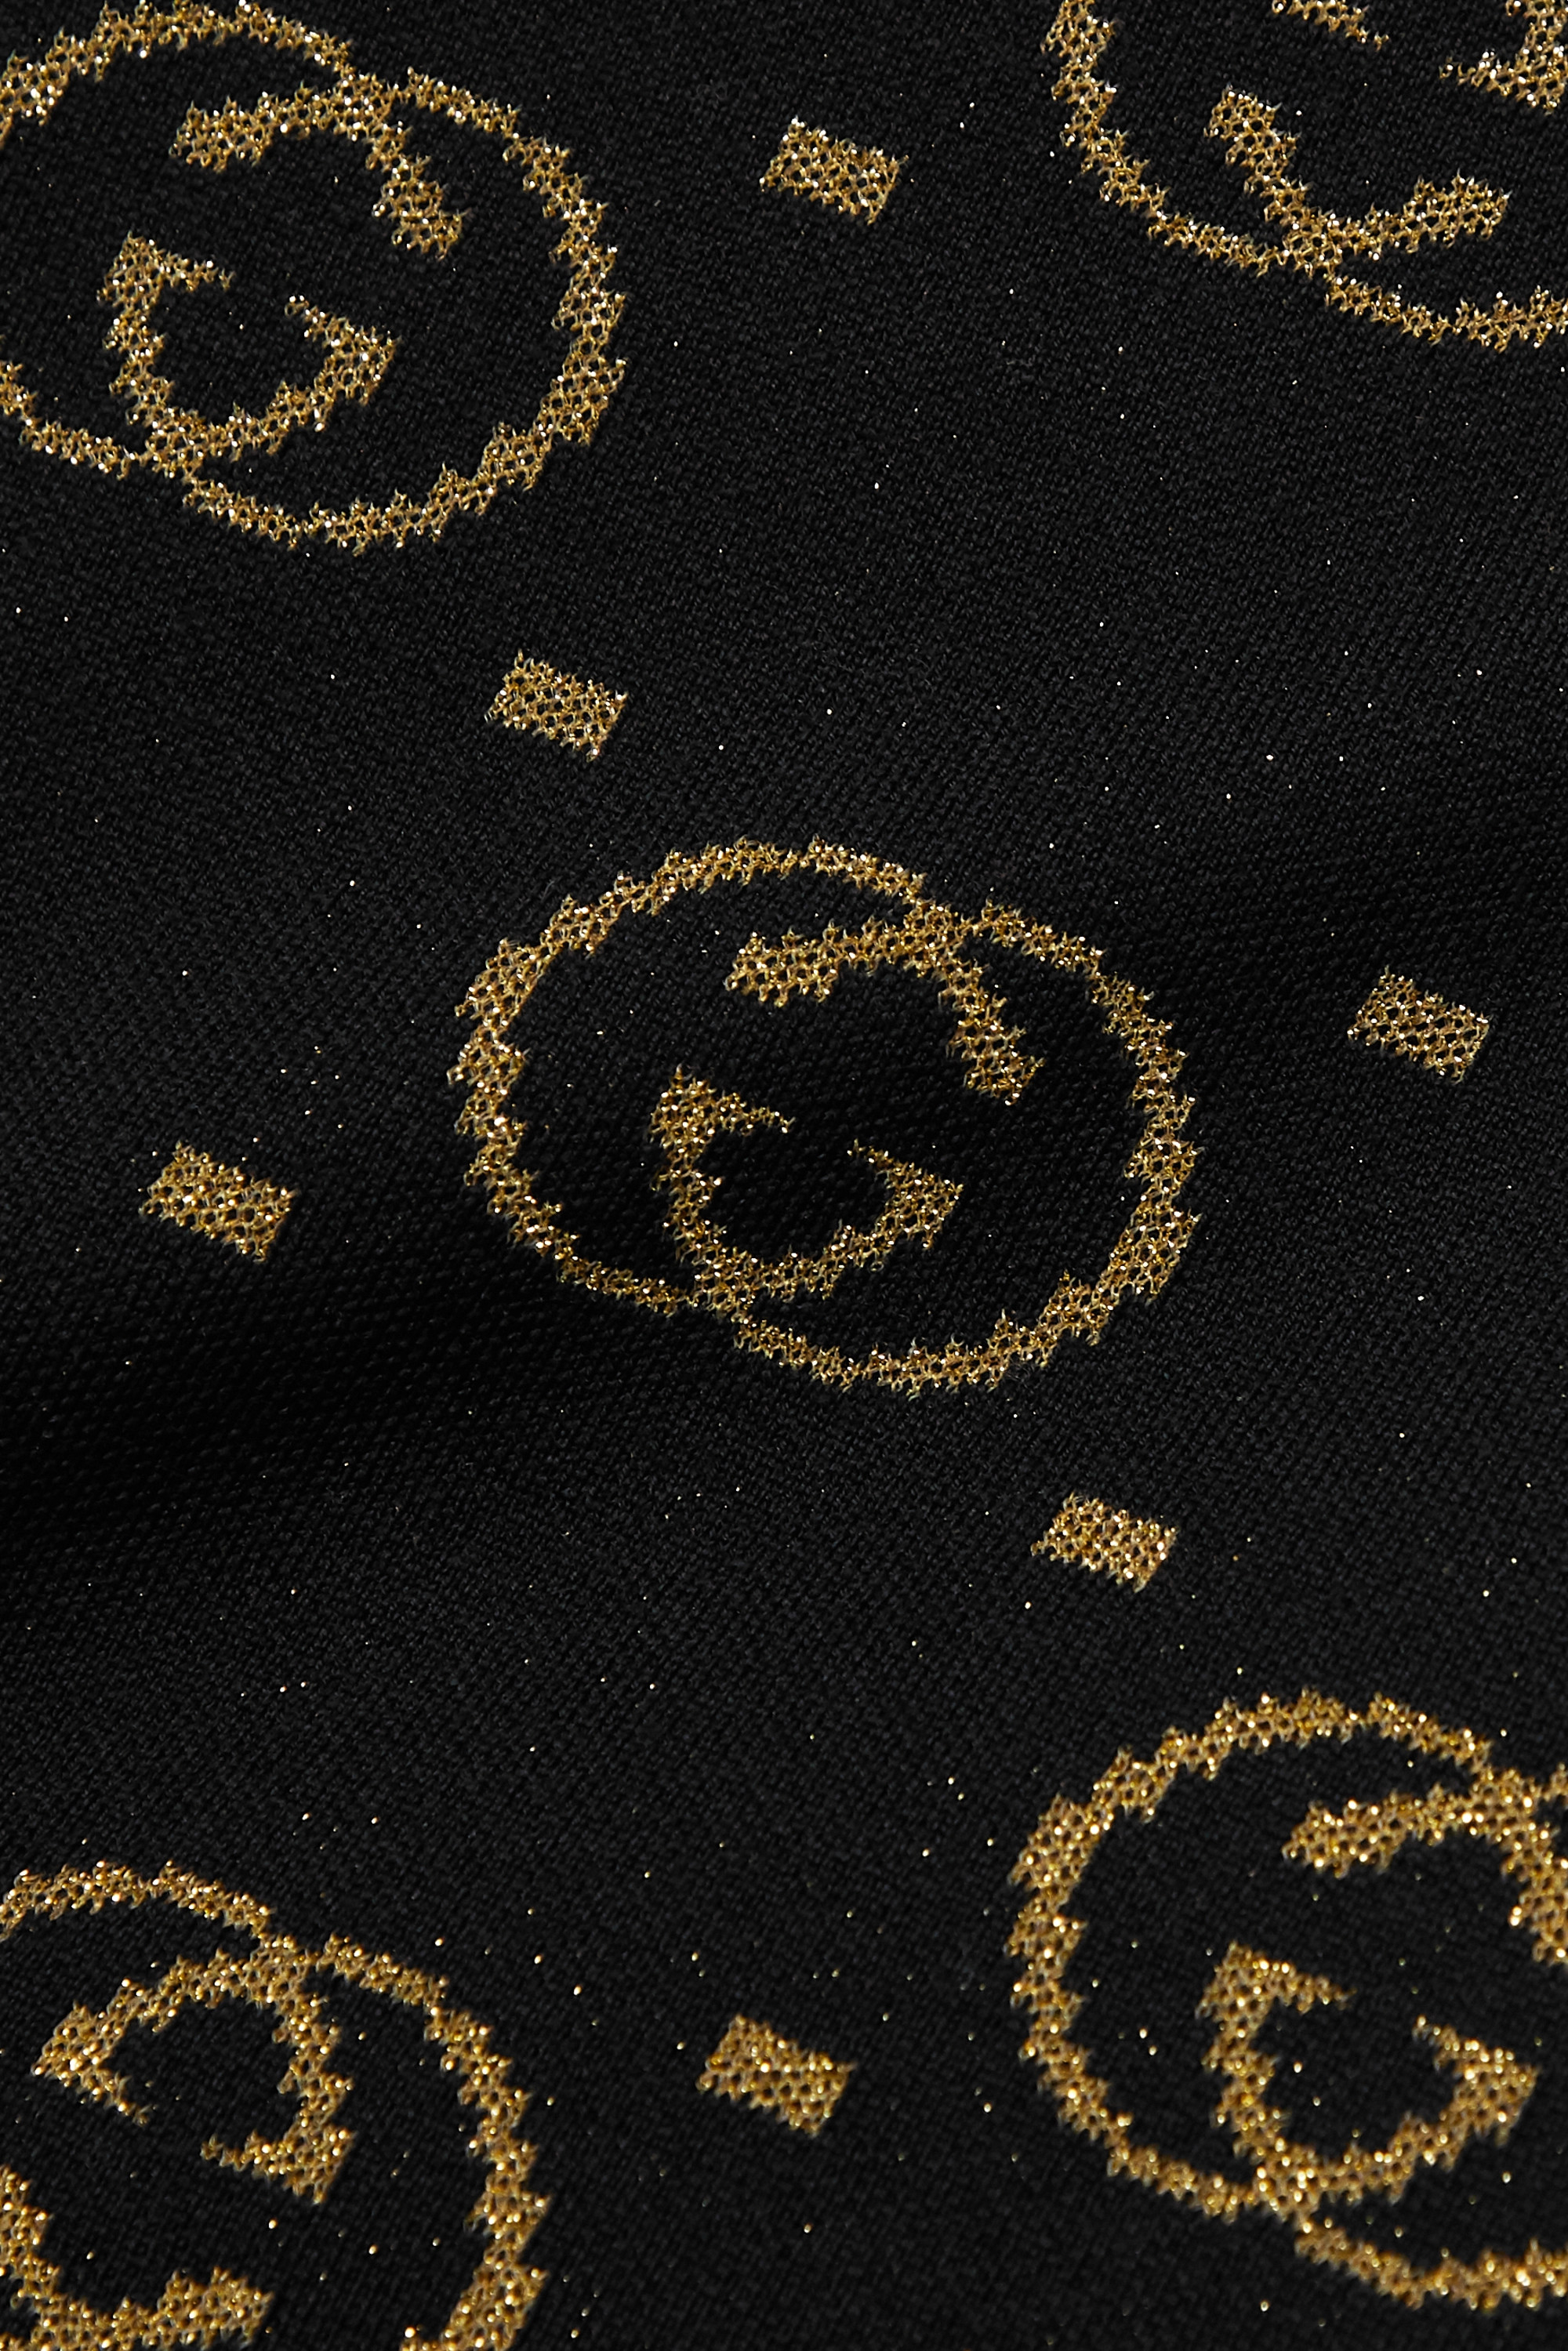 Gucci Jupe midi en laine mélangée métallisée intarsia